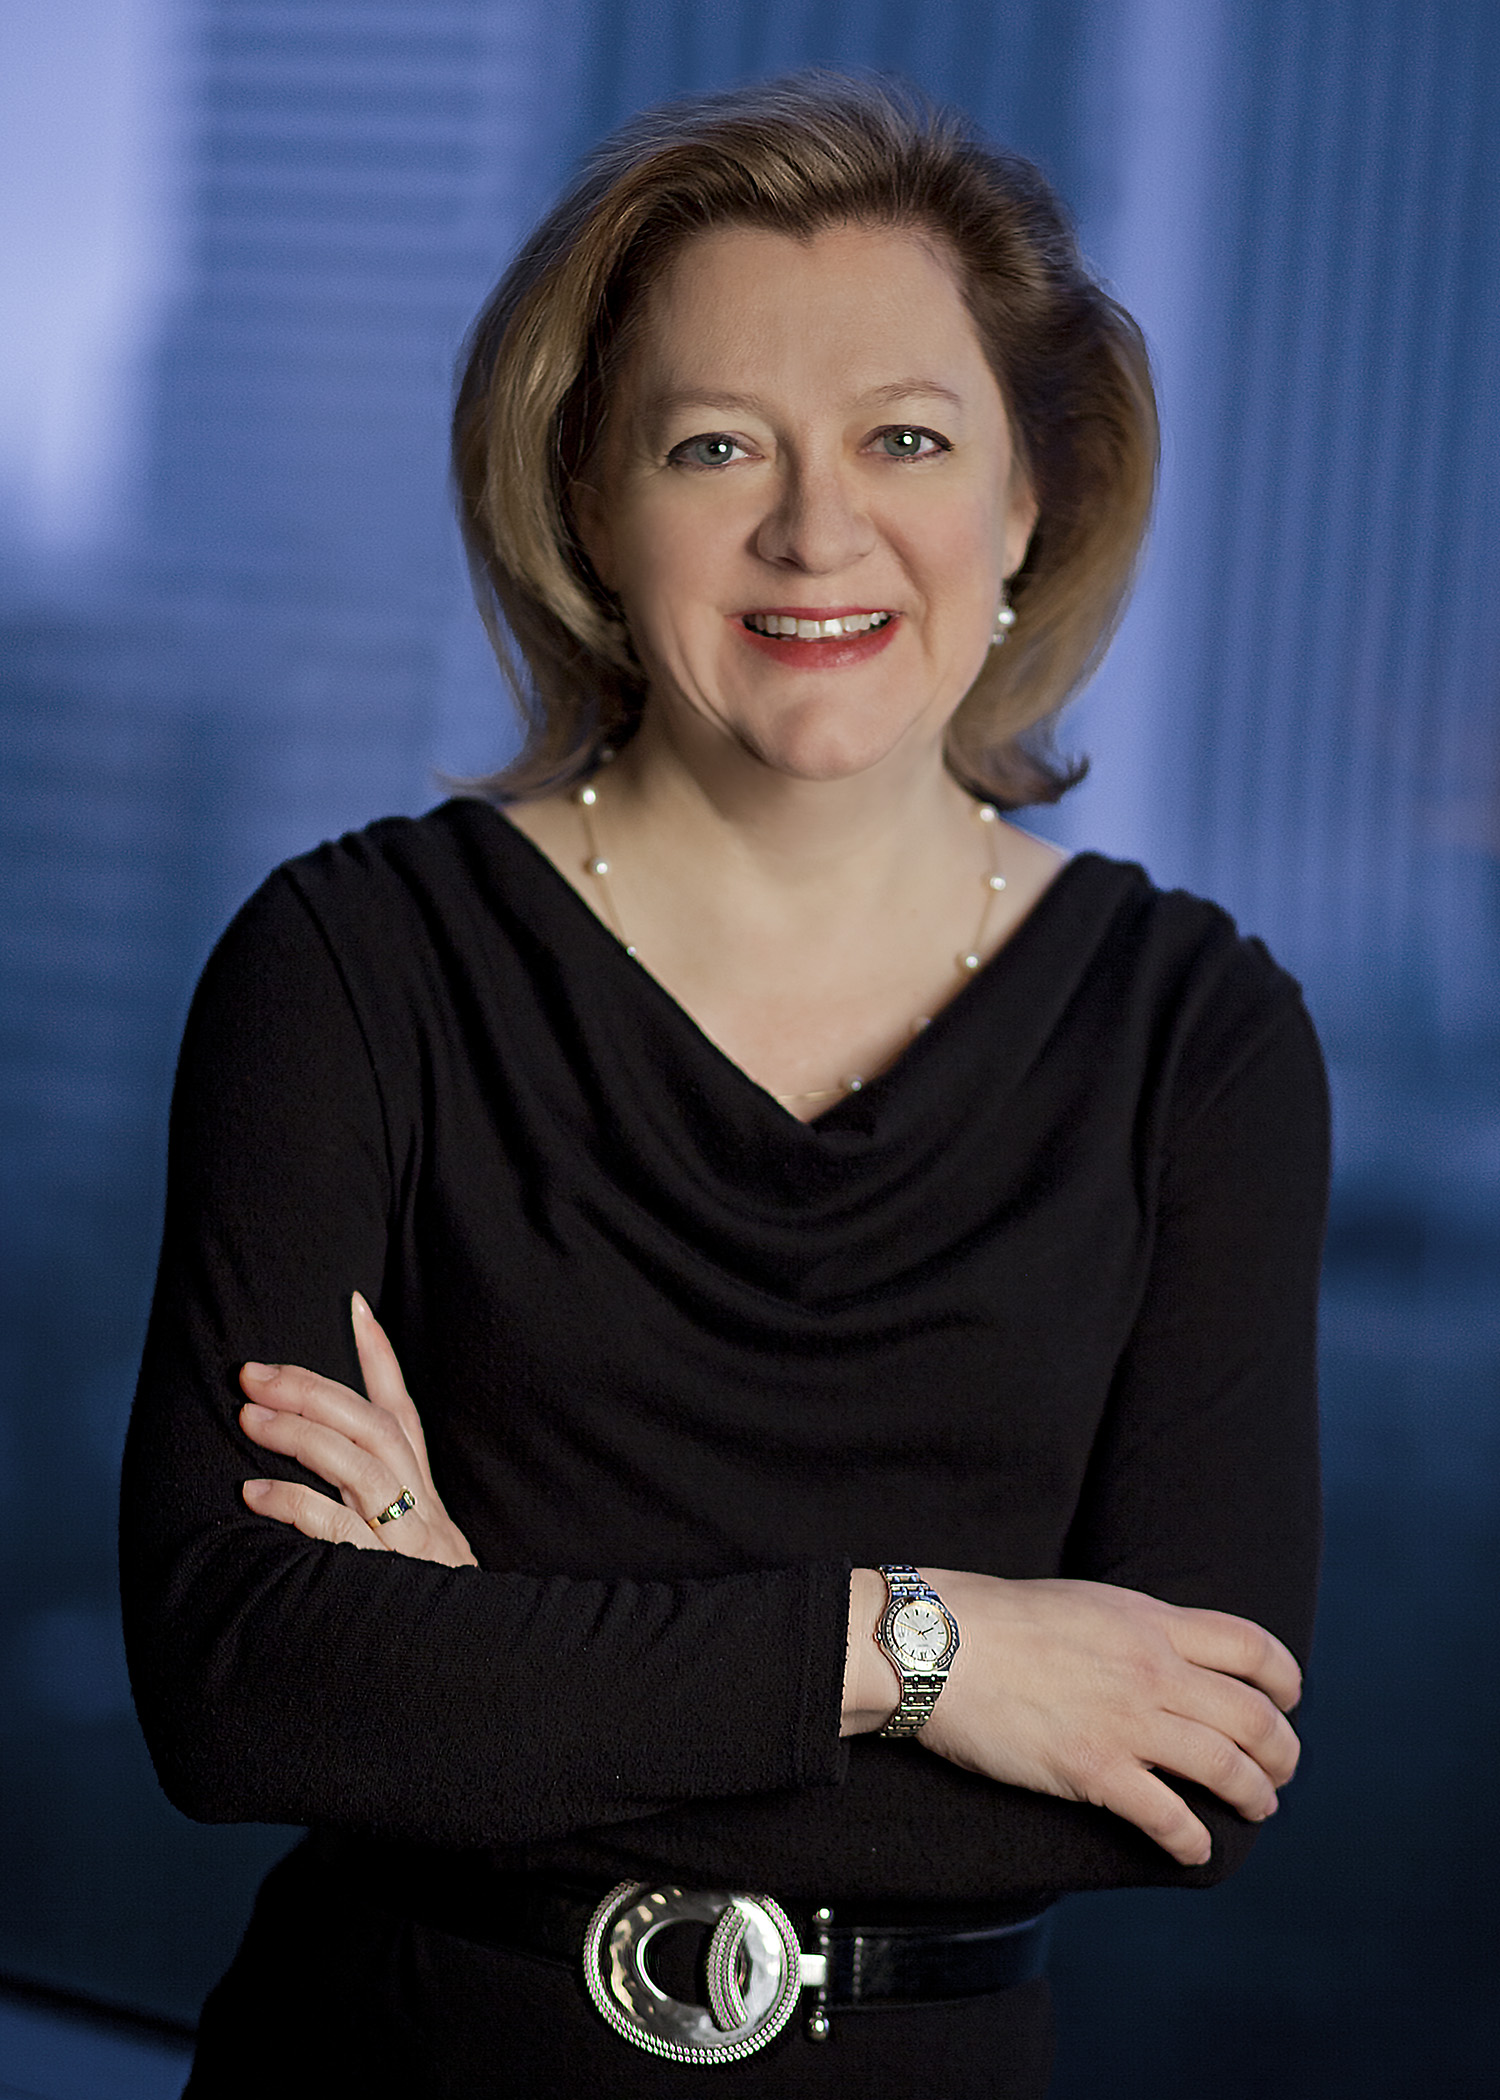 Lisa T. Murphy